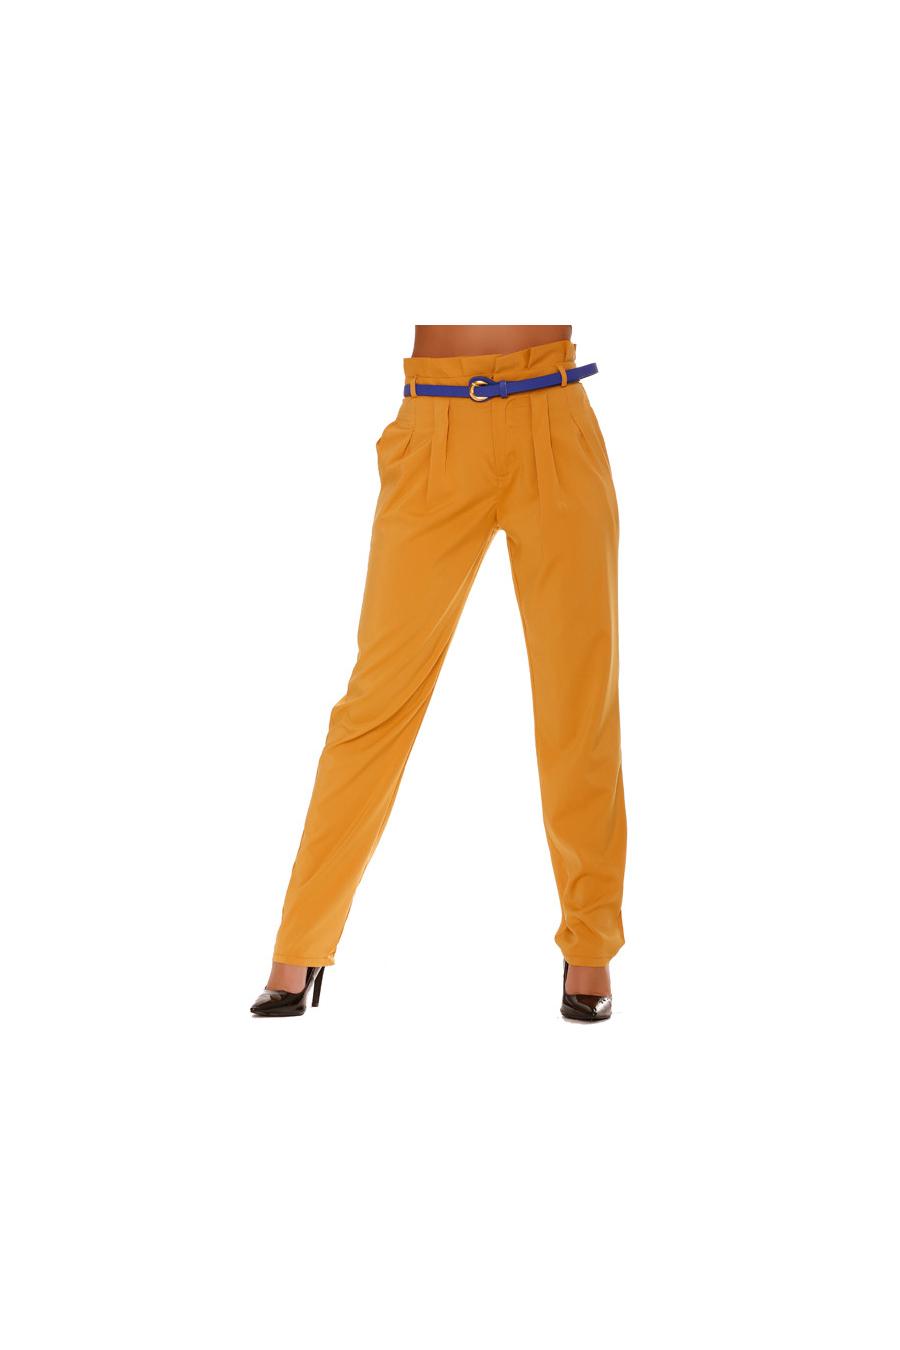 Pantalon Moutarde Fluide coupe Carotte. Taille